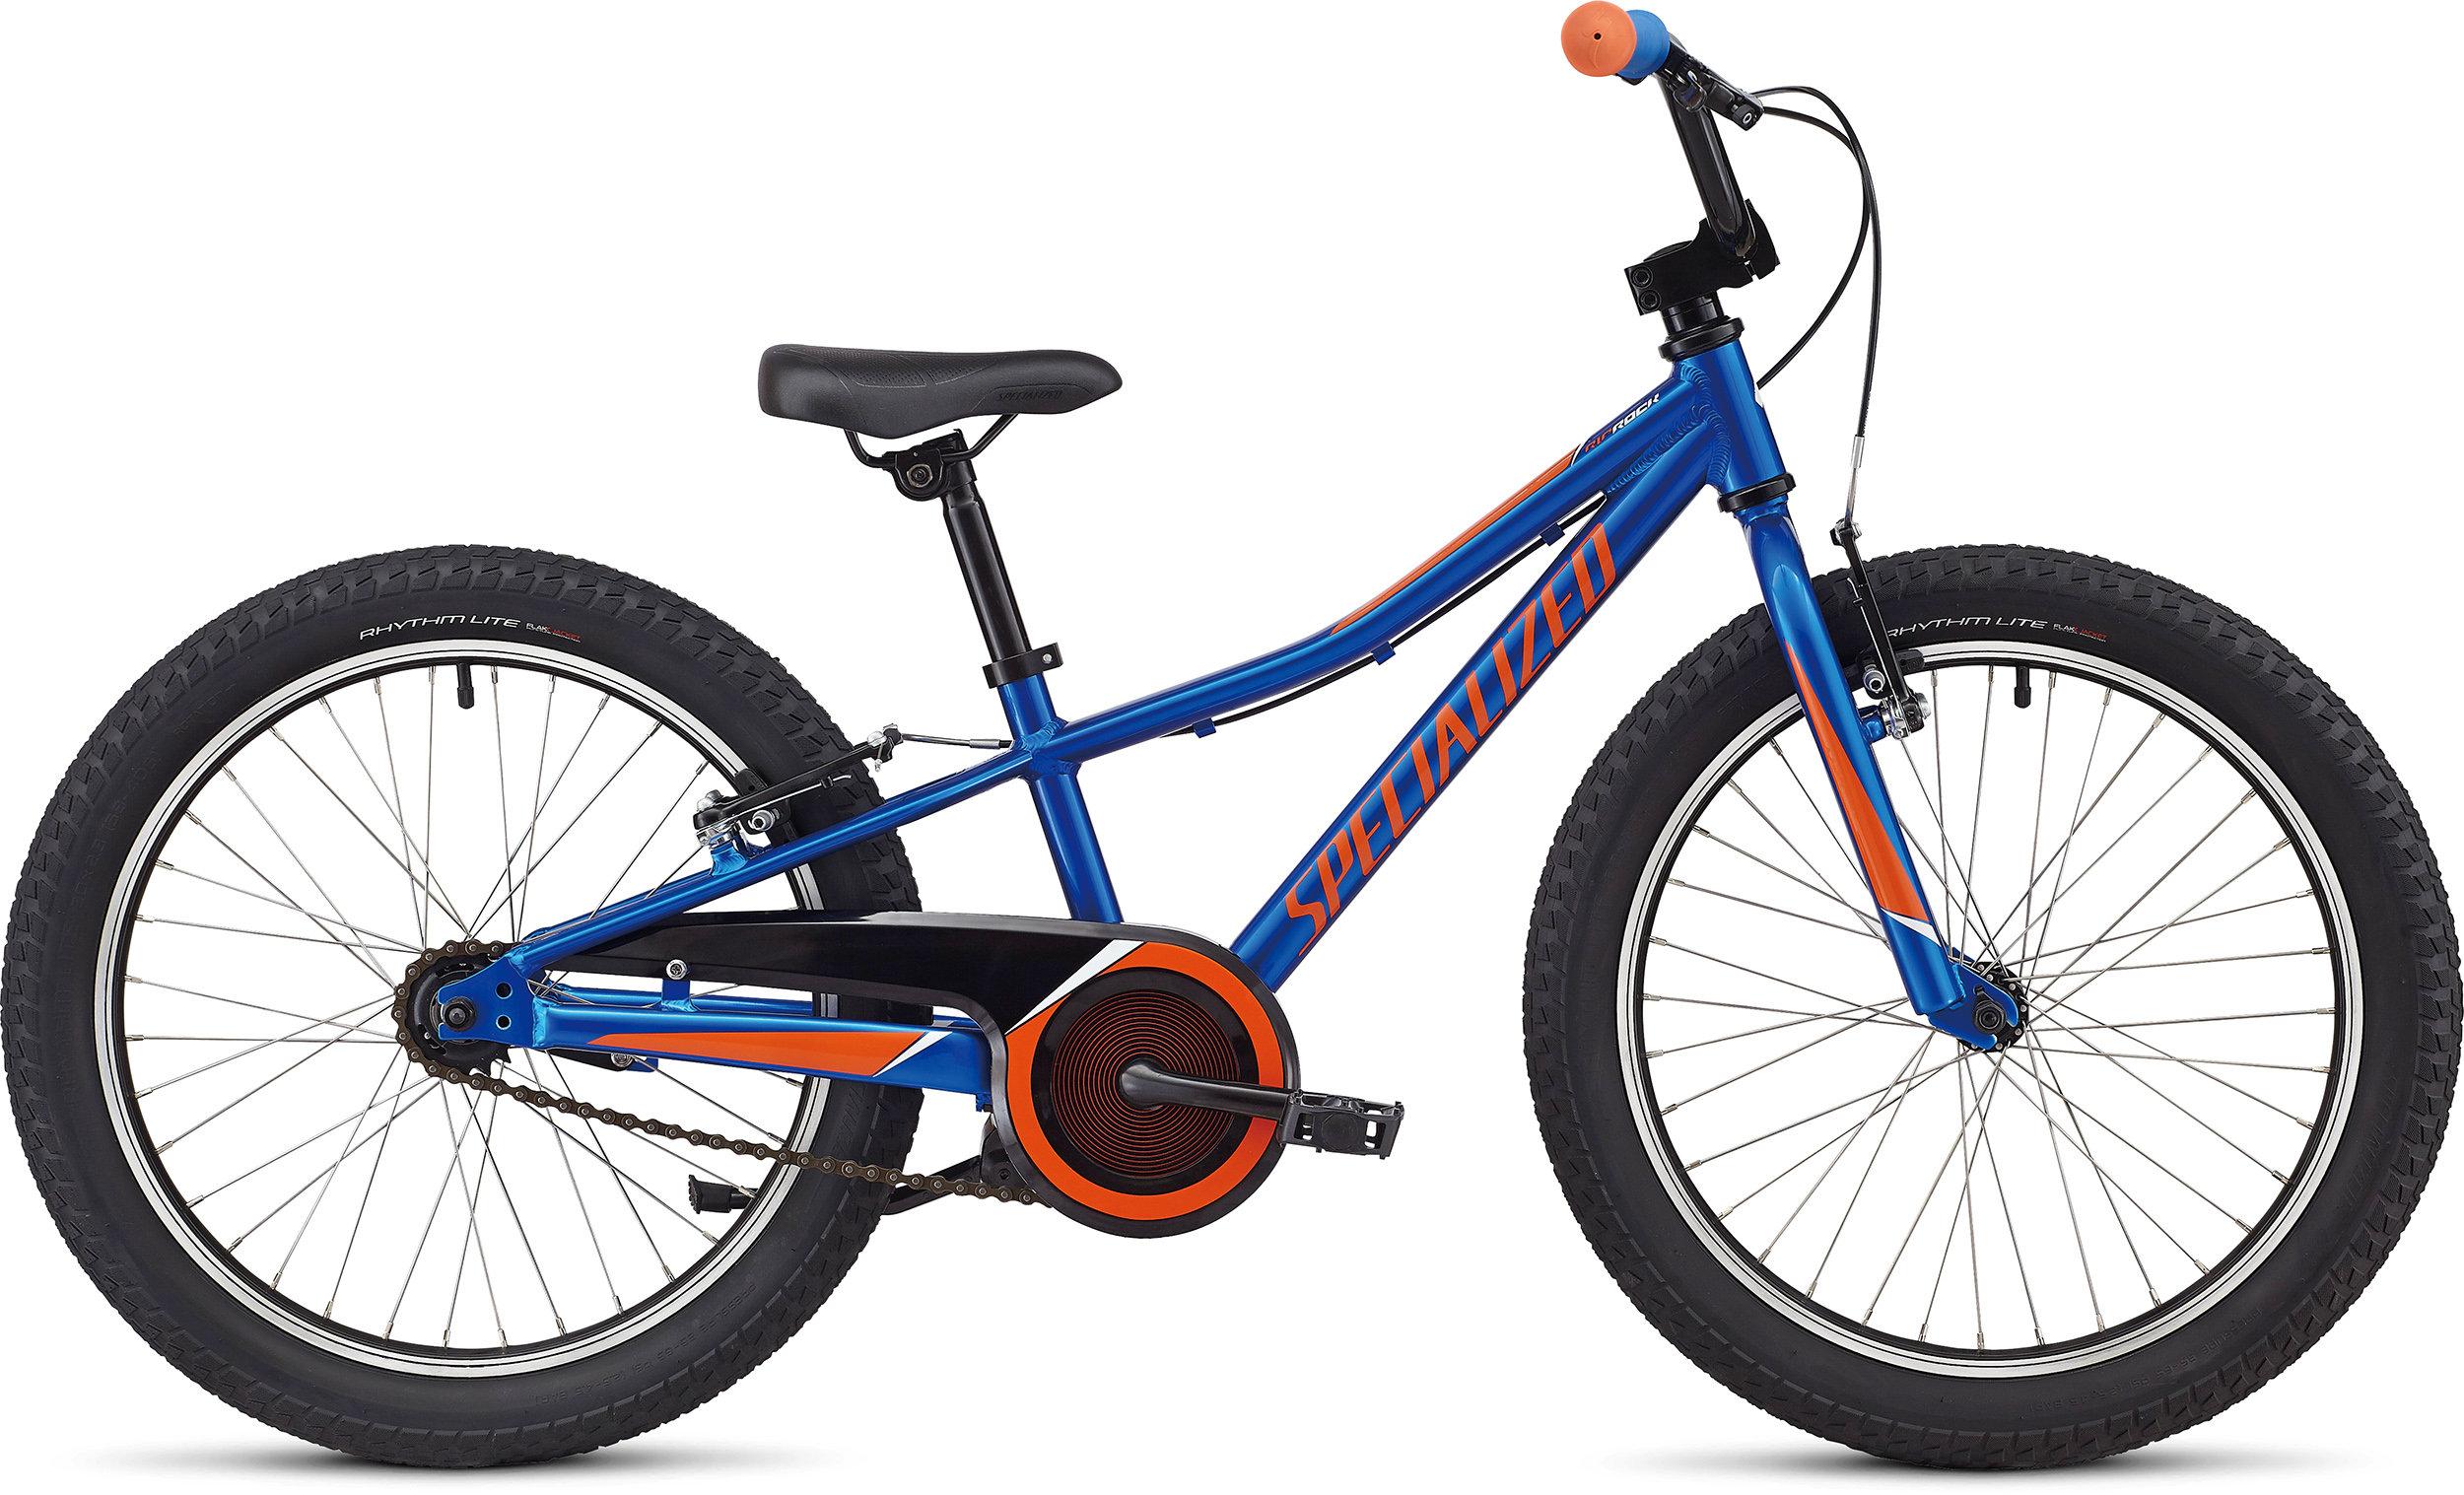 Specialized Riprock Coaster 20 Gloss Royal Blue/Moto Orange/White 9 - Alpha Bikes